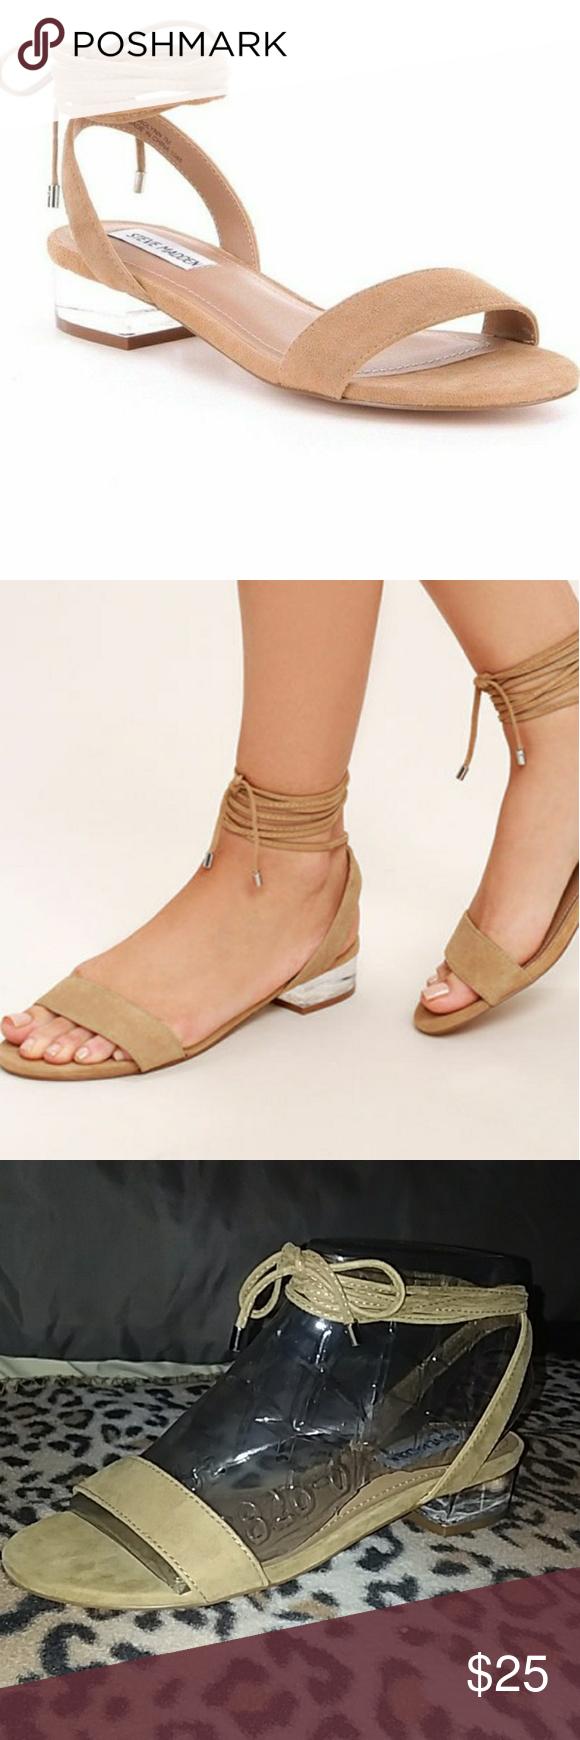 73a378e773a STEVE MADDEN SIZE 6 CAROLYN Clear heel sandal Unworn!!! Manufacturer  Steve  Madden